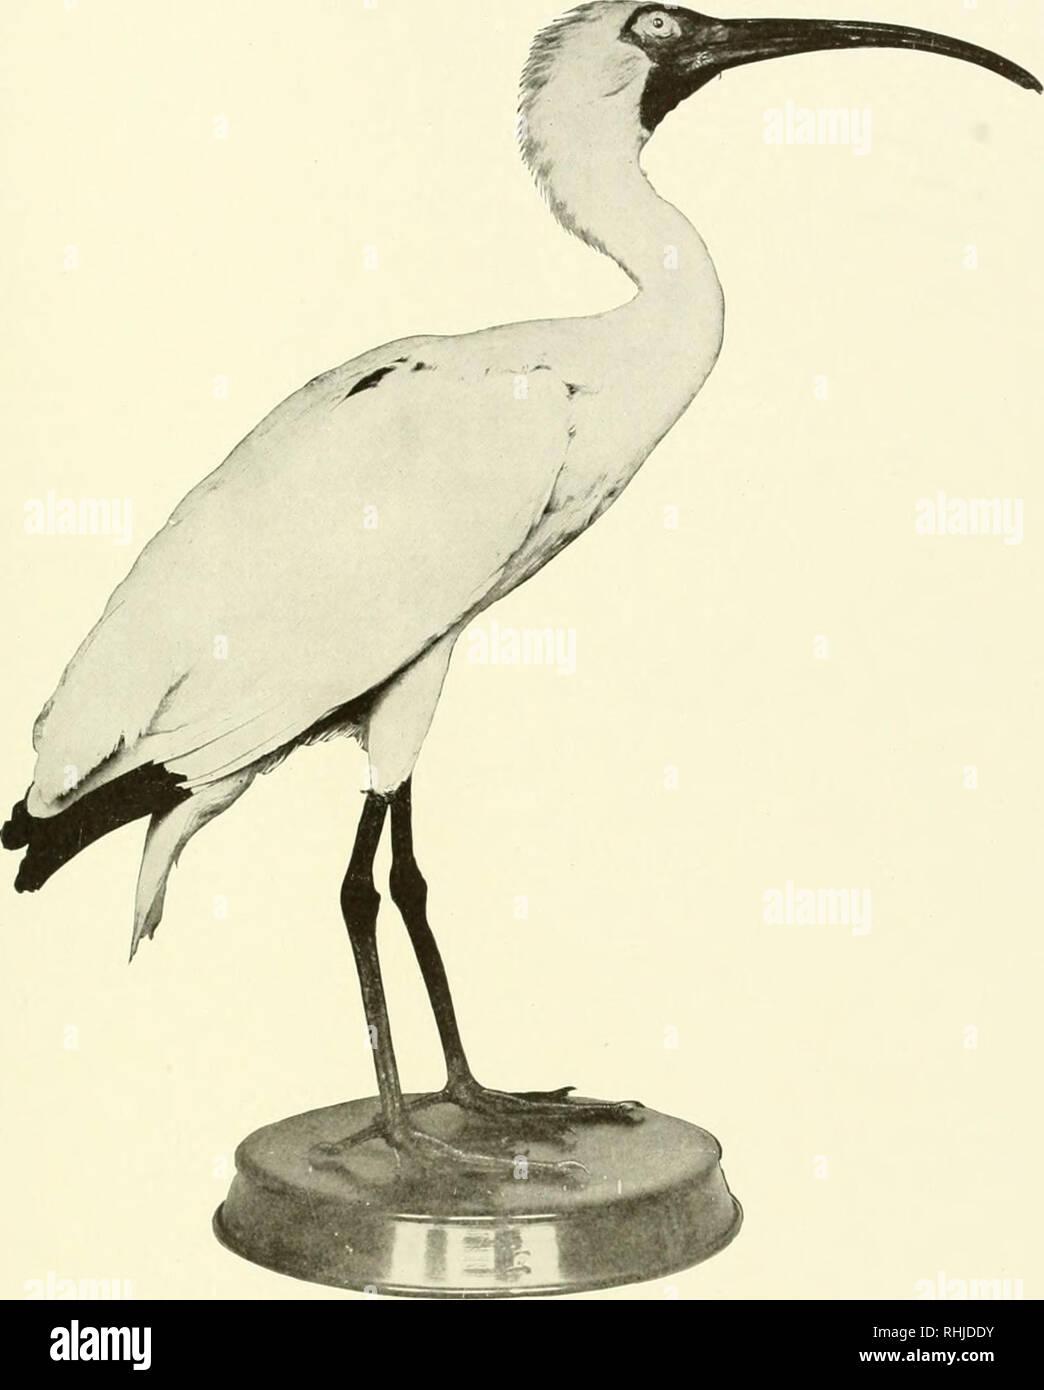 Ibis A New York birds of new york. birds. birds of new york 241. white ibis